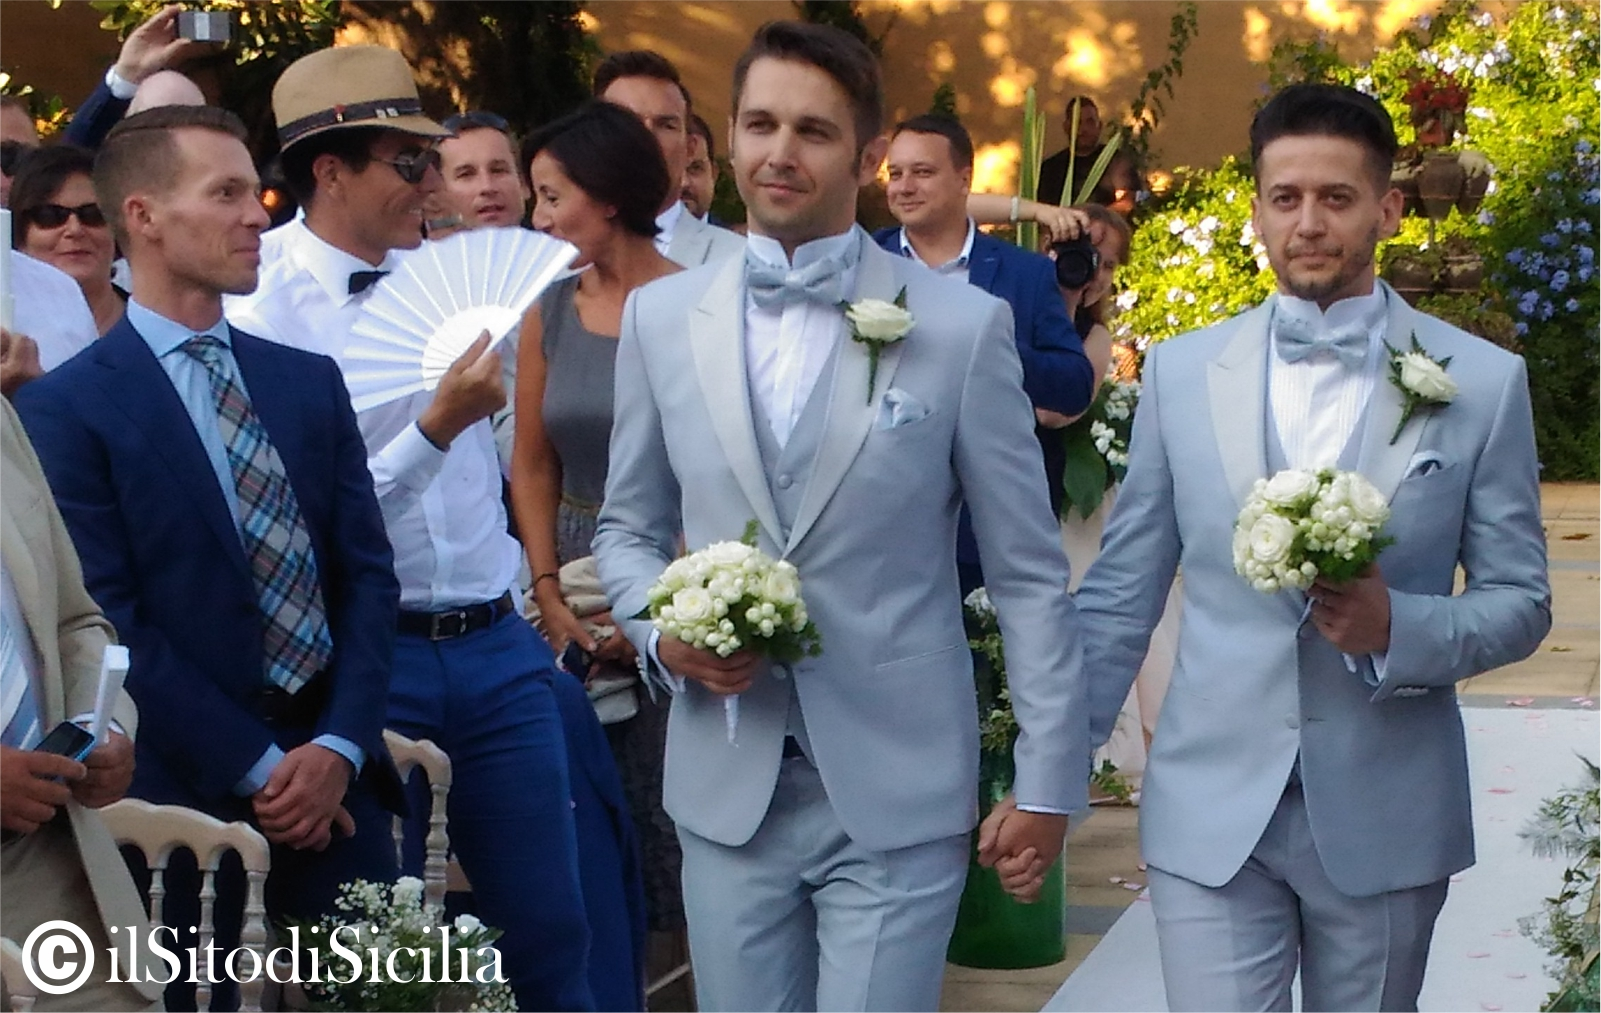 Gay & Vip: Giuseppe e Krzys, a Palermo il loro sogno d'amore.